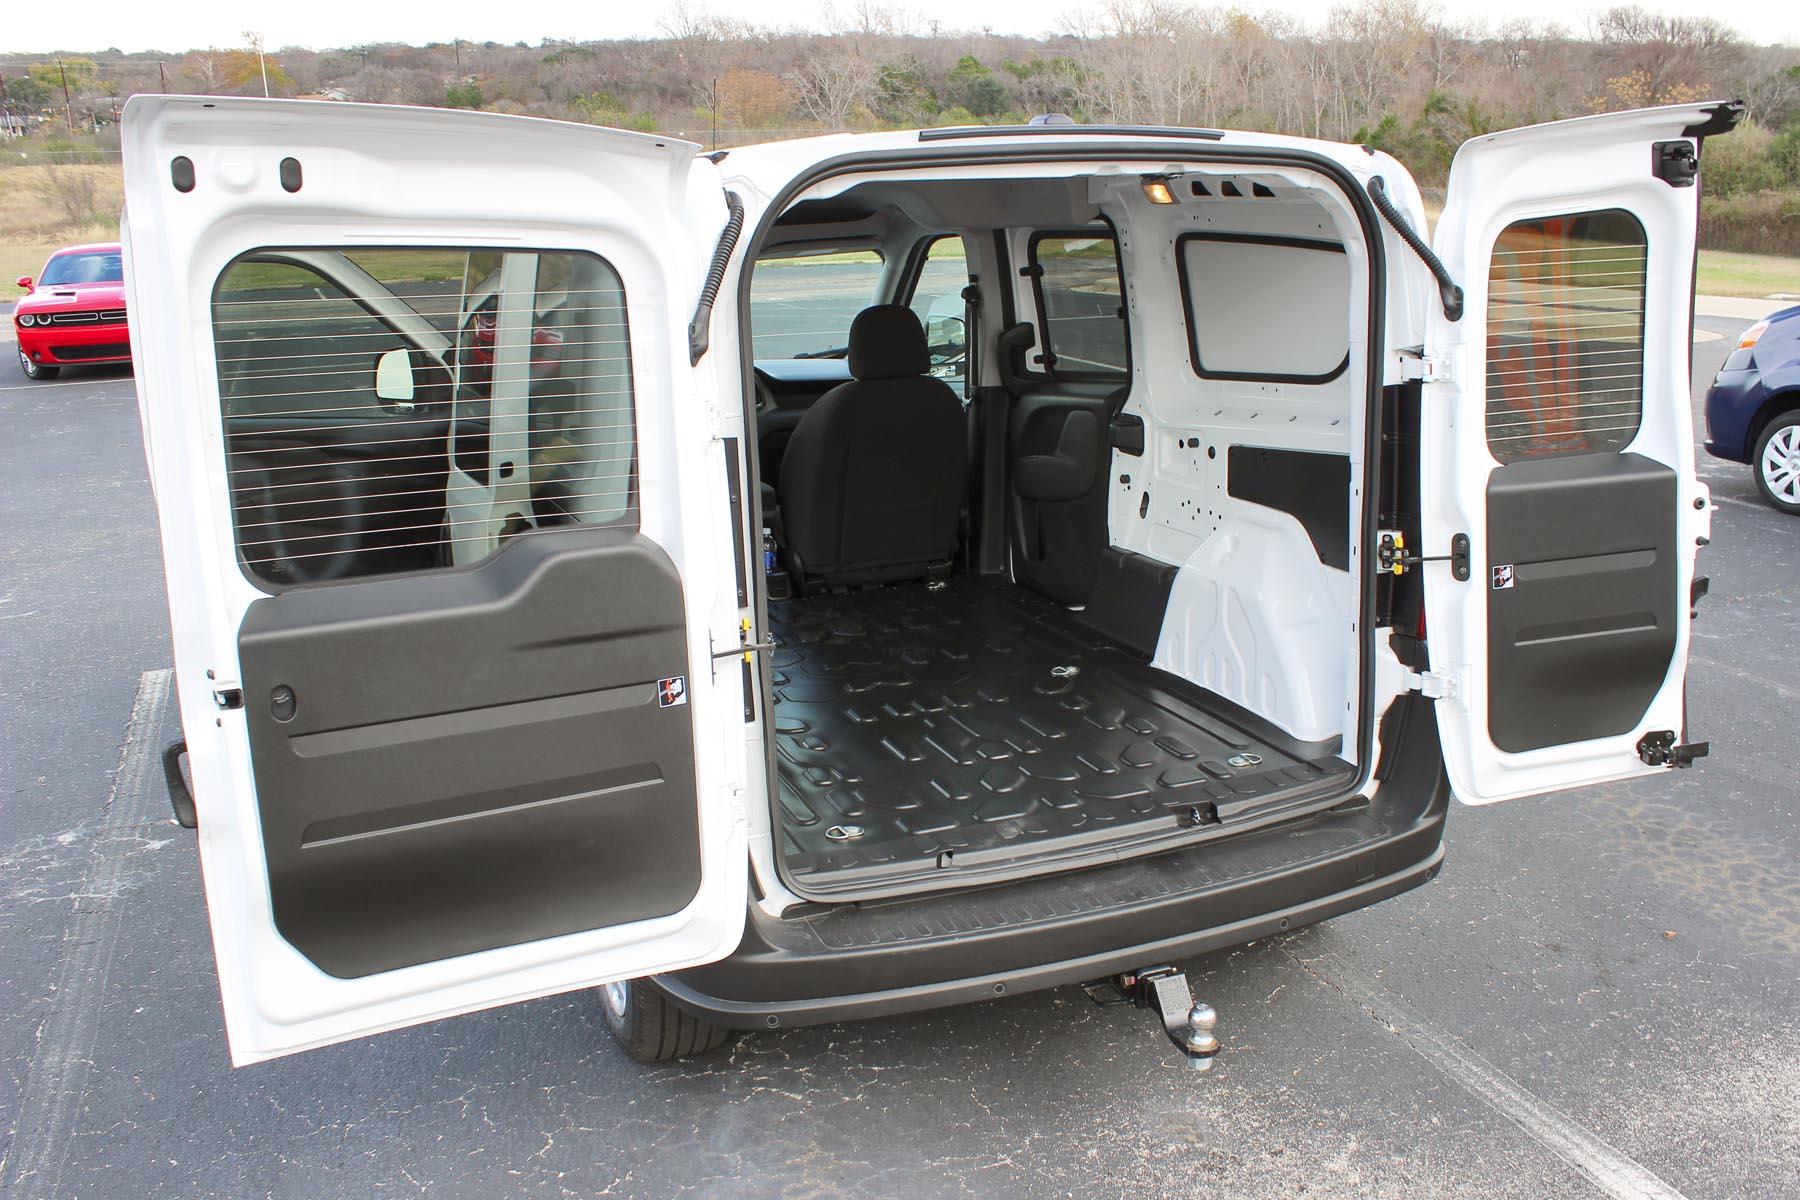 2015 ram promaster city cargo van st. Black Bedroom Furniture Sets. Home Design Ideas